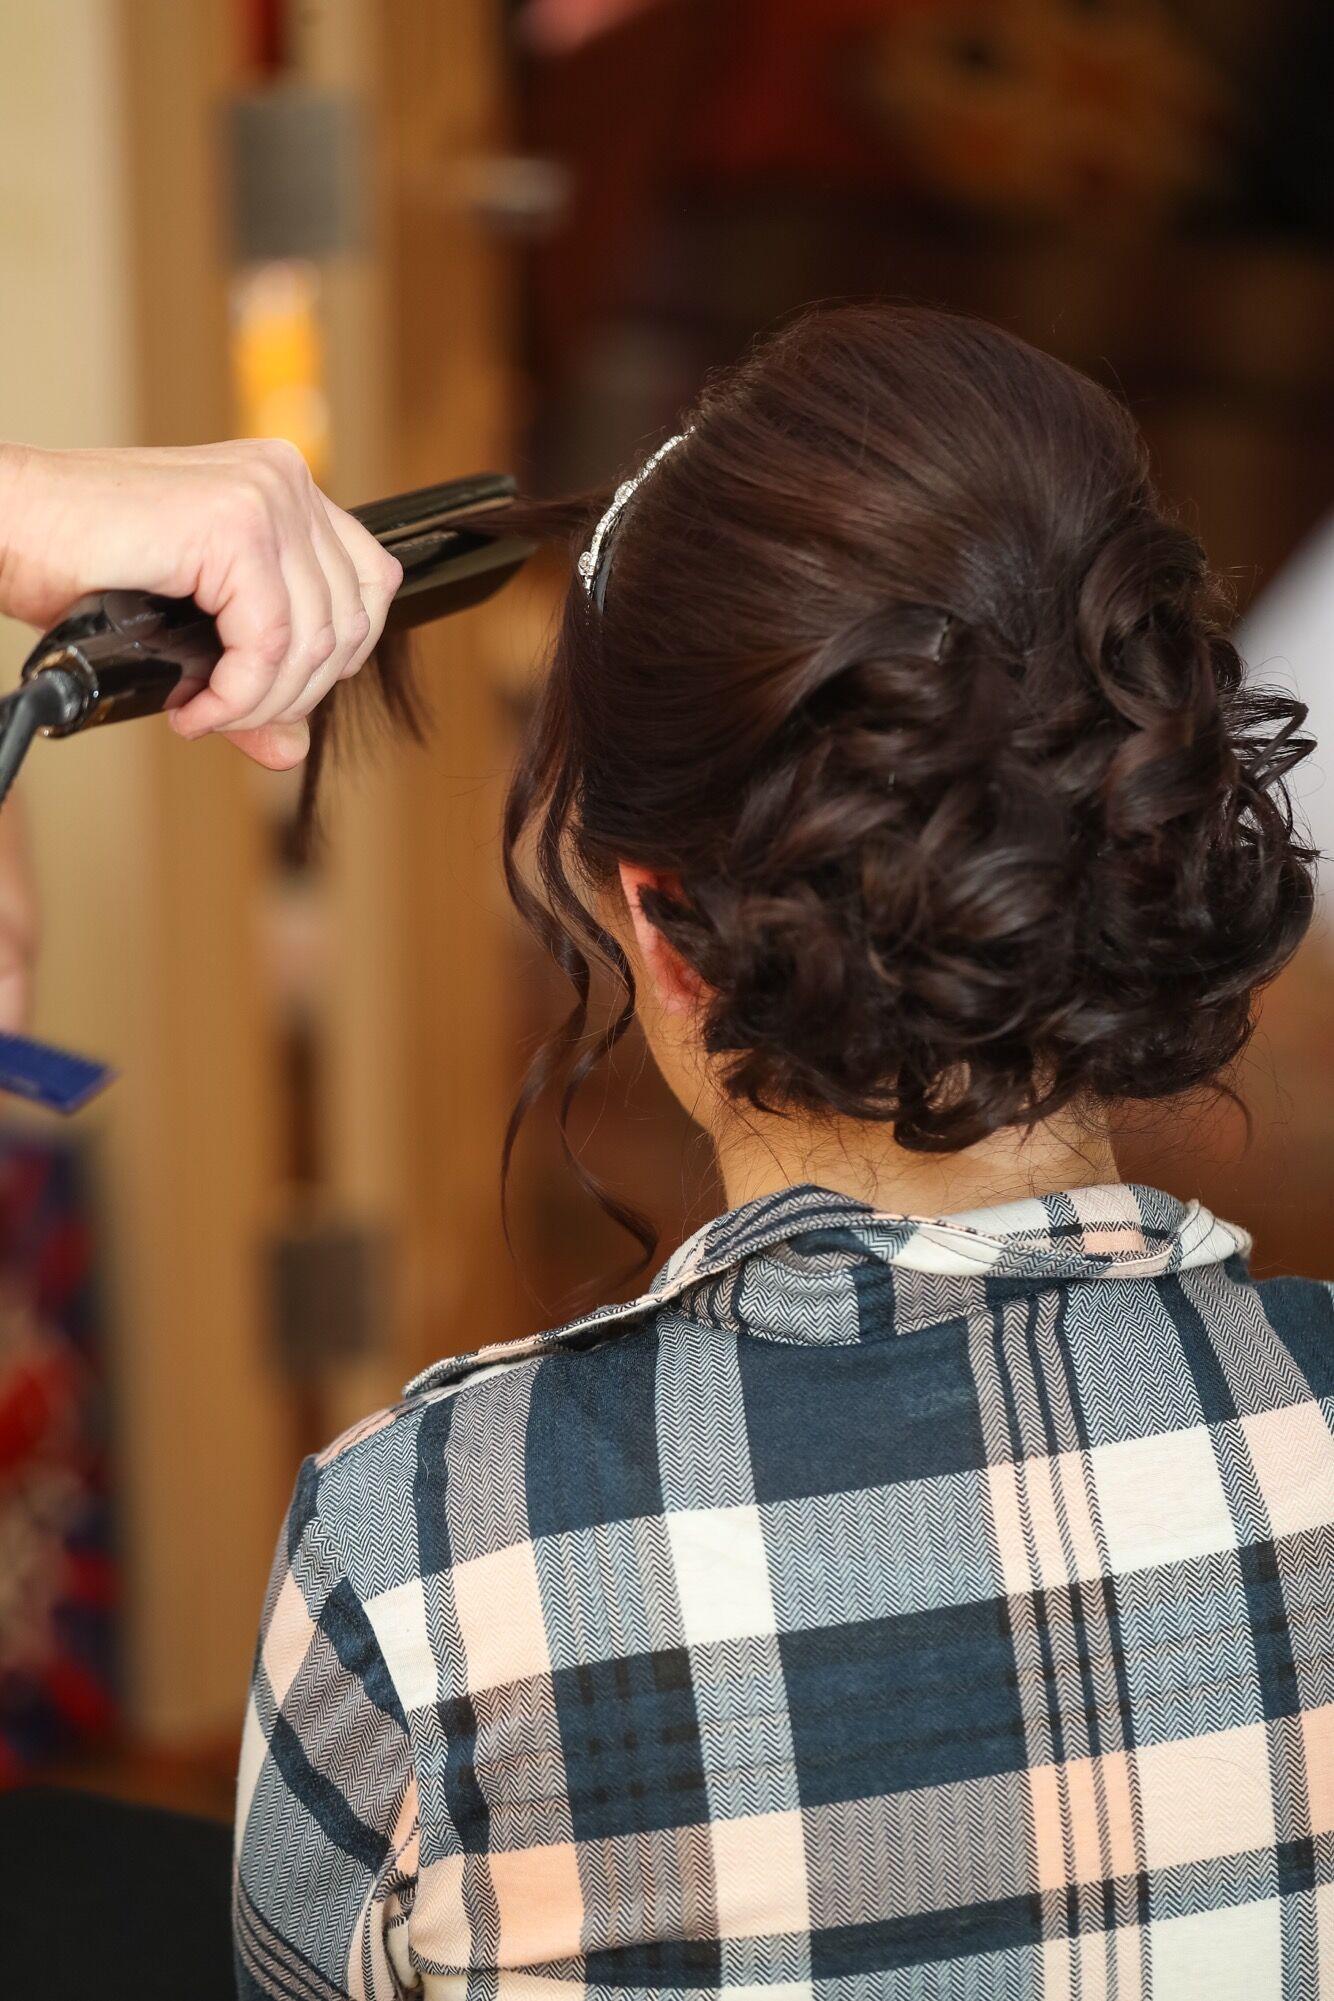 beauty salons in joliet, il - the knot